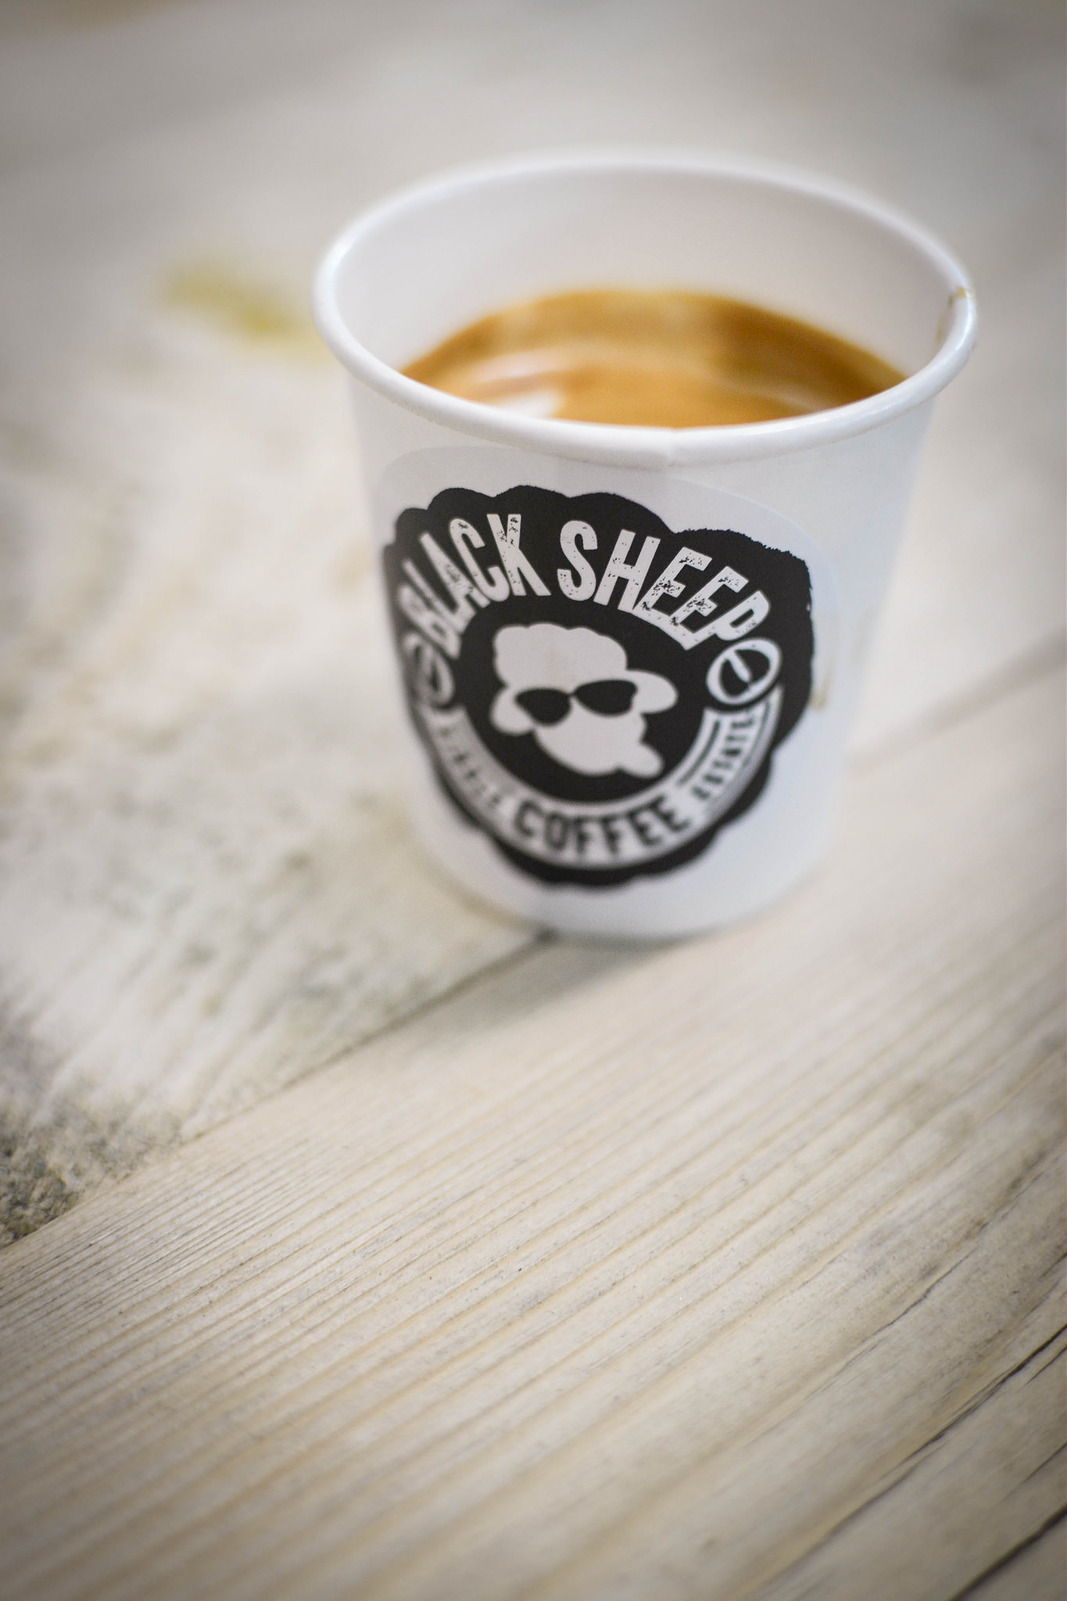 Black Sheep Coffee,coffee, robusta coffee